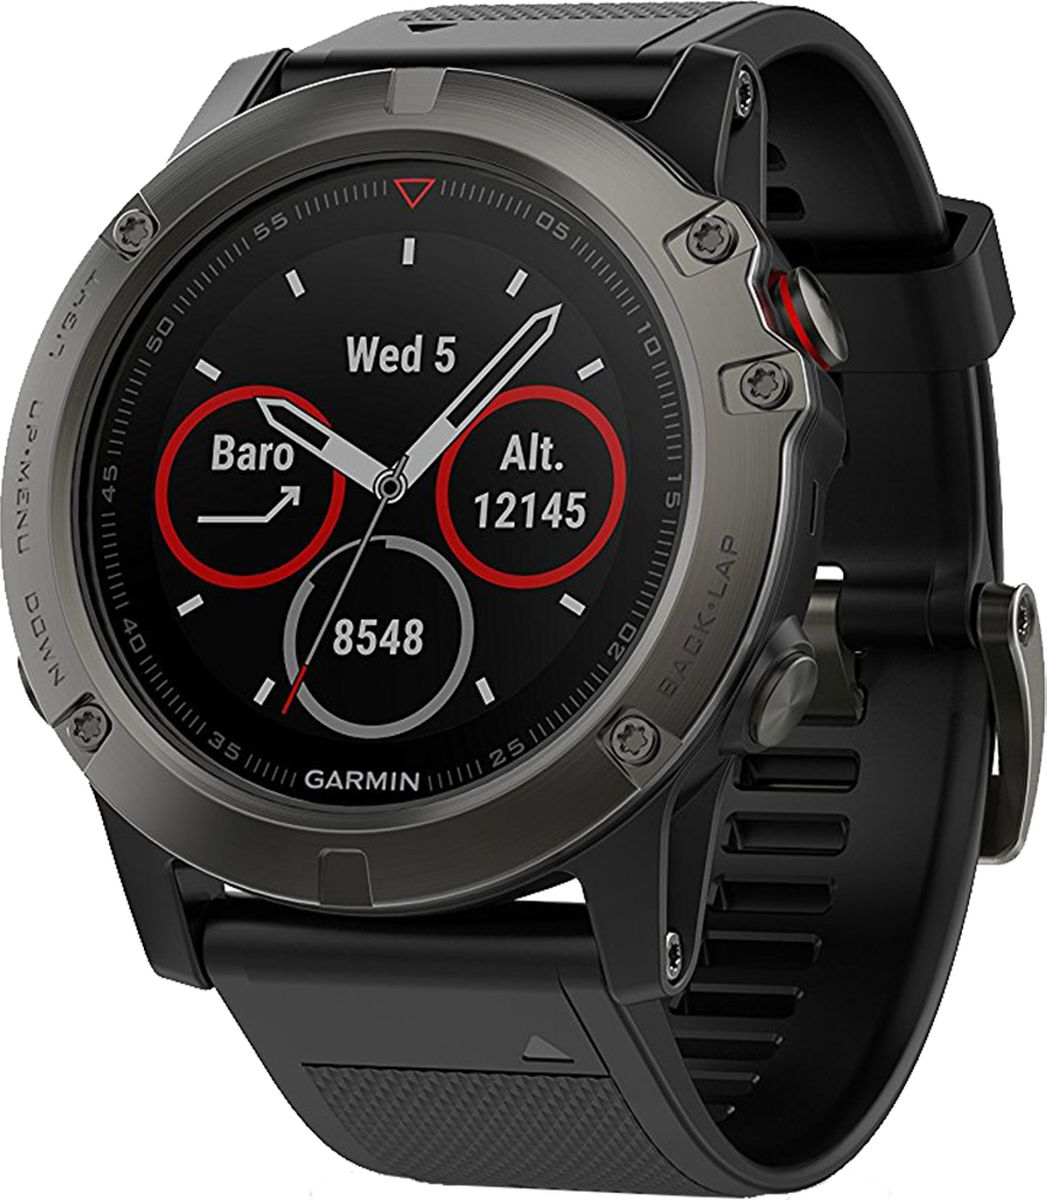 Часы спортивные Garmin  Fenix 5X Sapphire , цвет: серый. 010-01733-01 - Умные часы